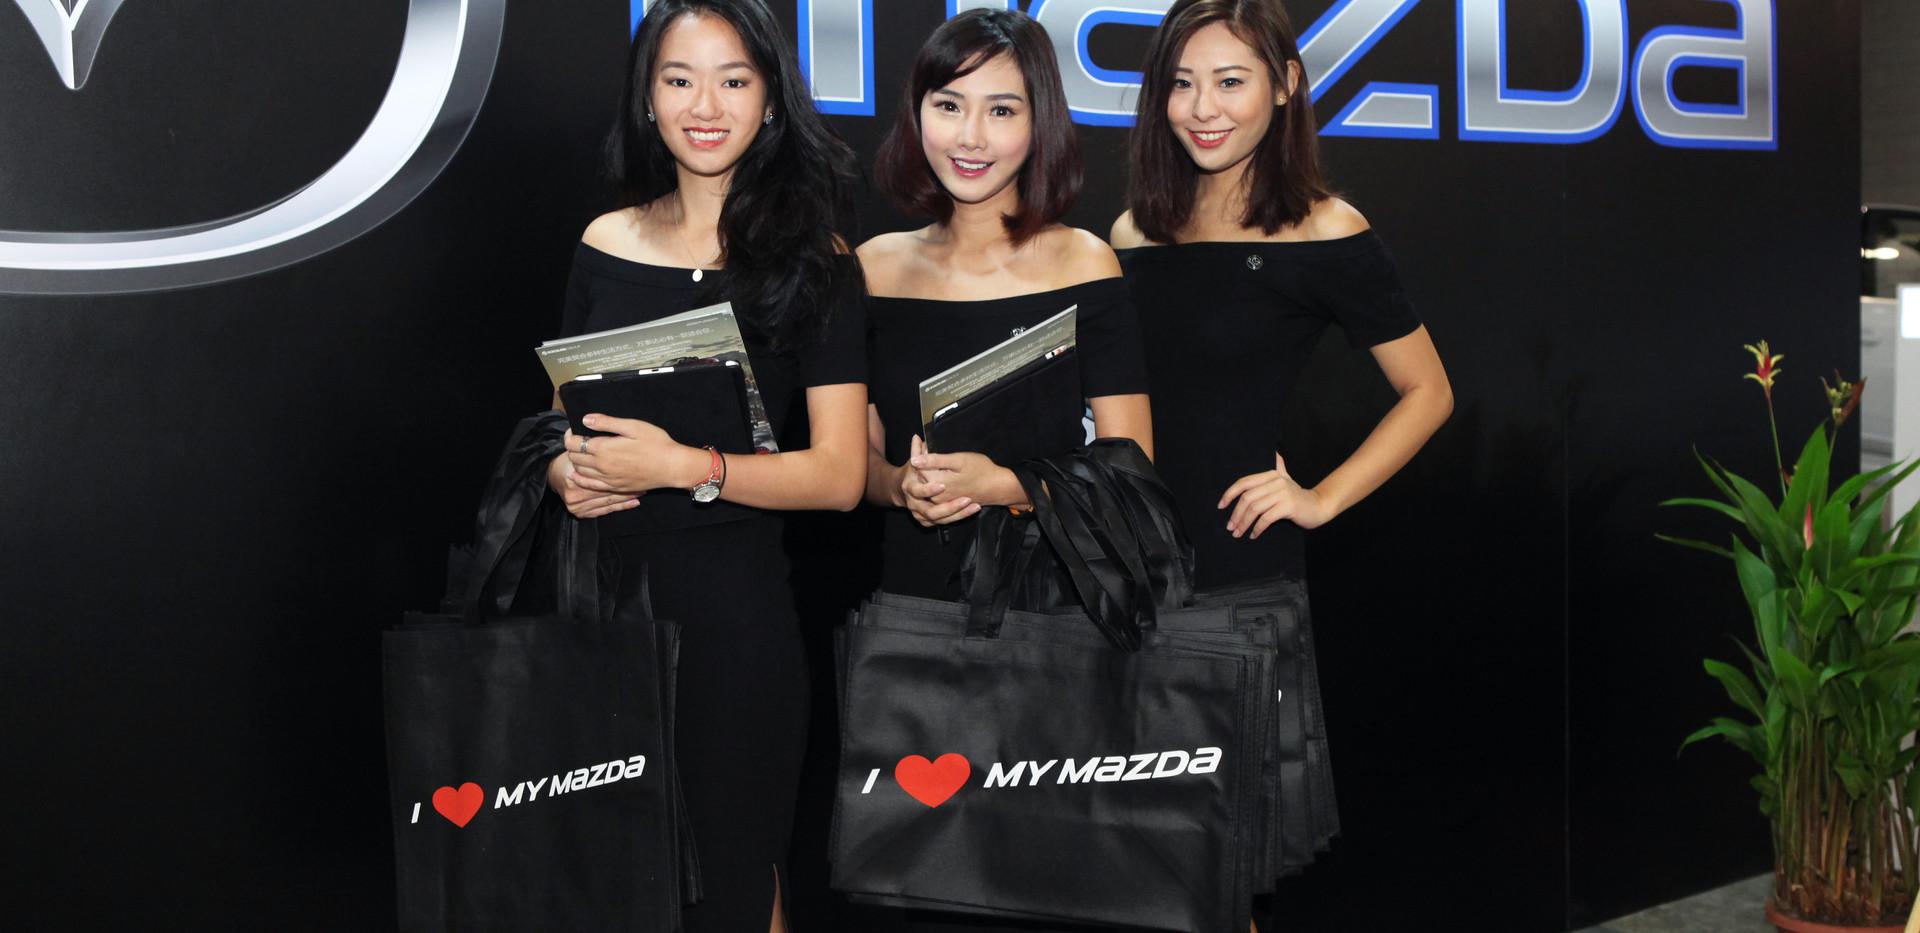 Mazda Cars @ Expo